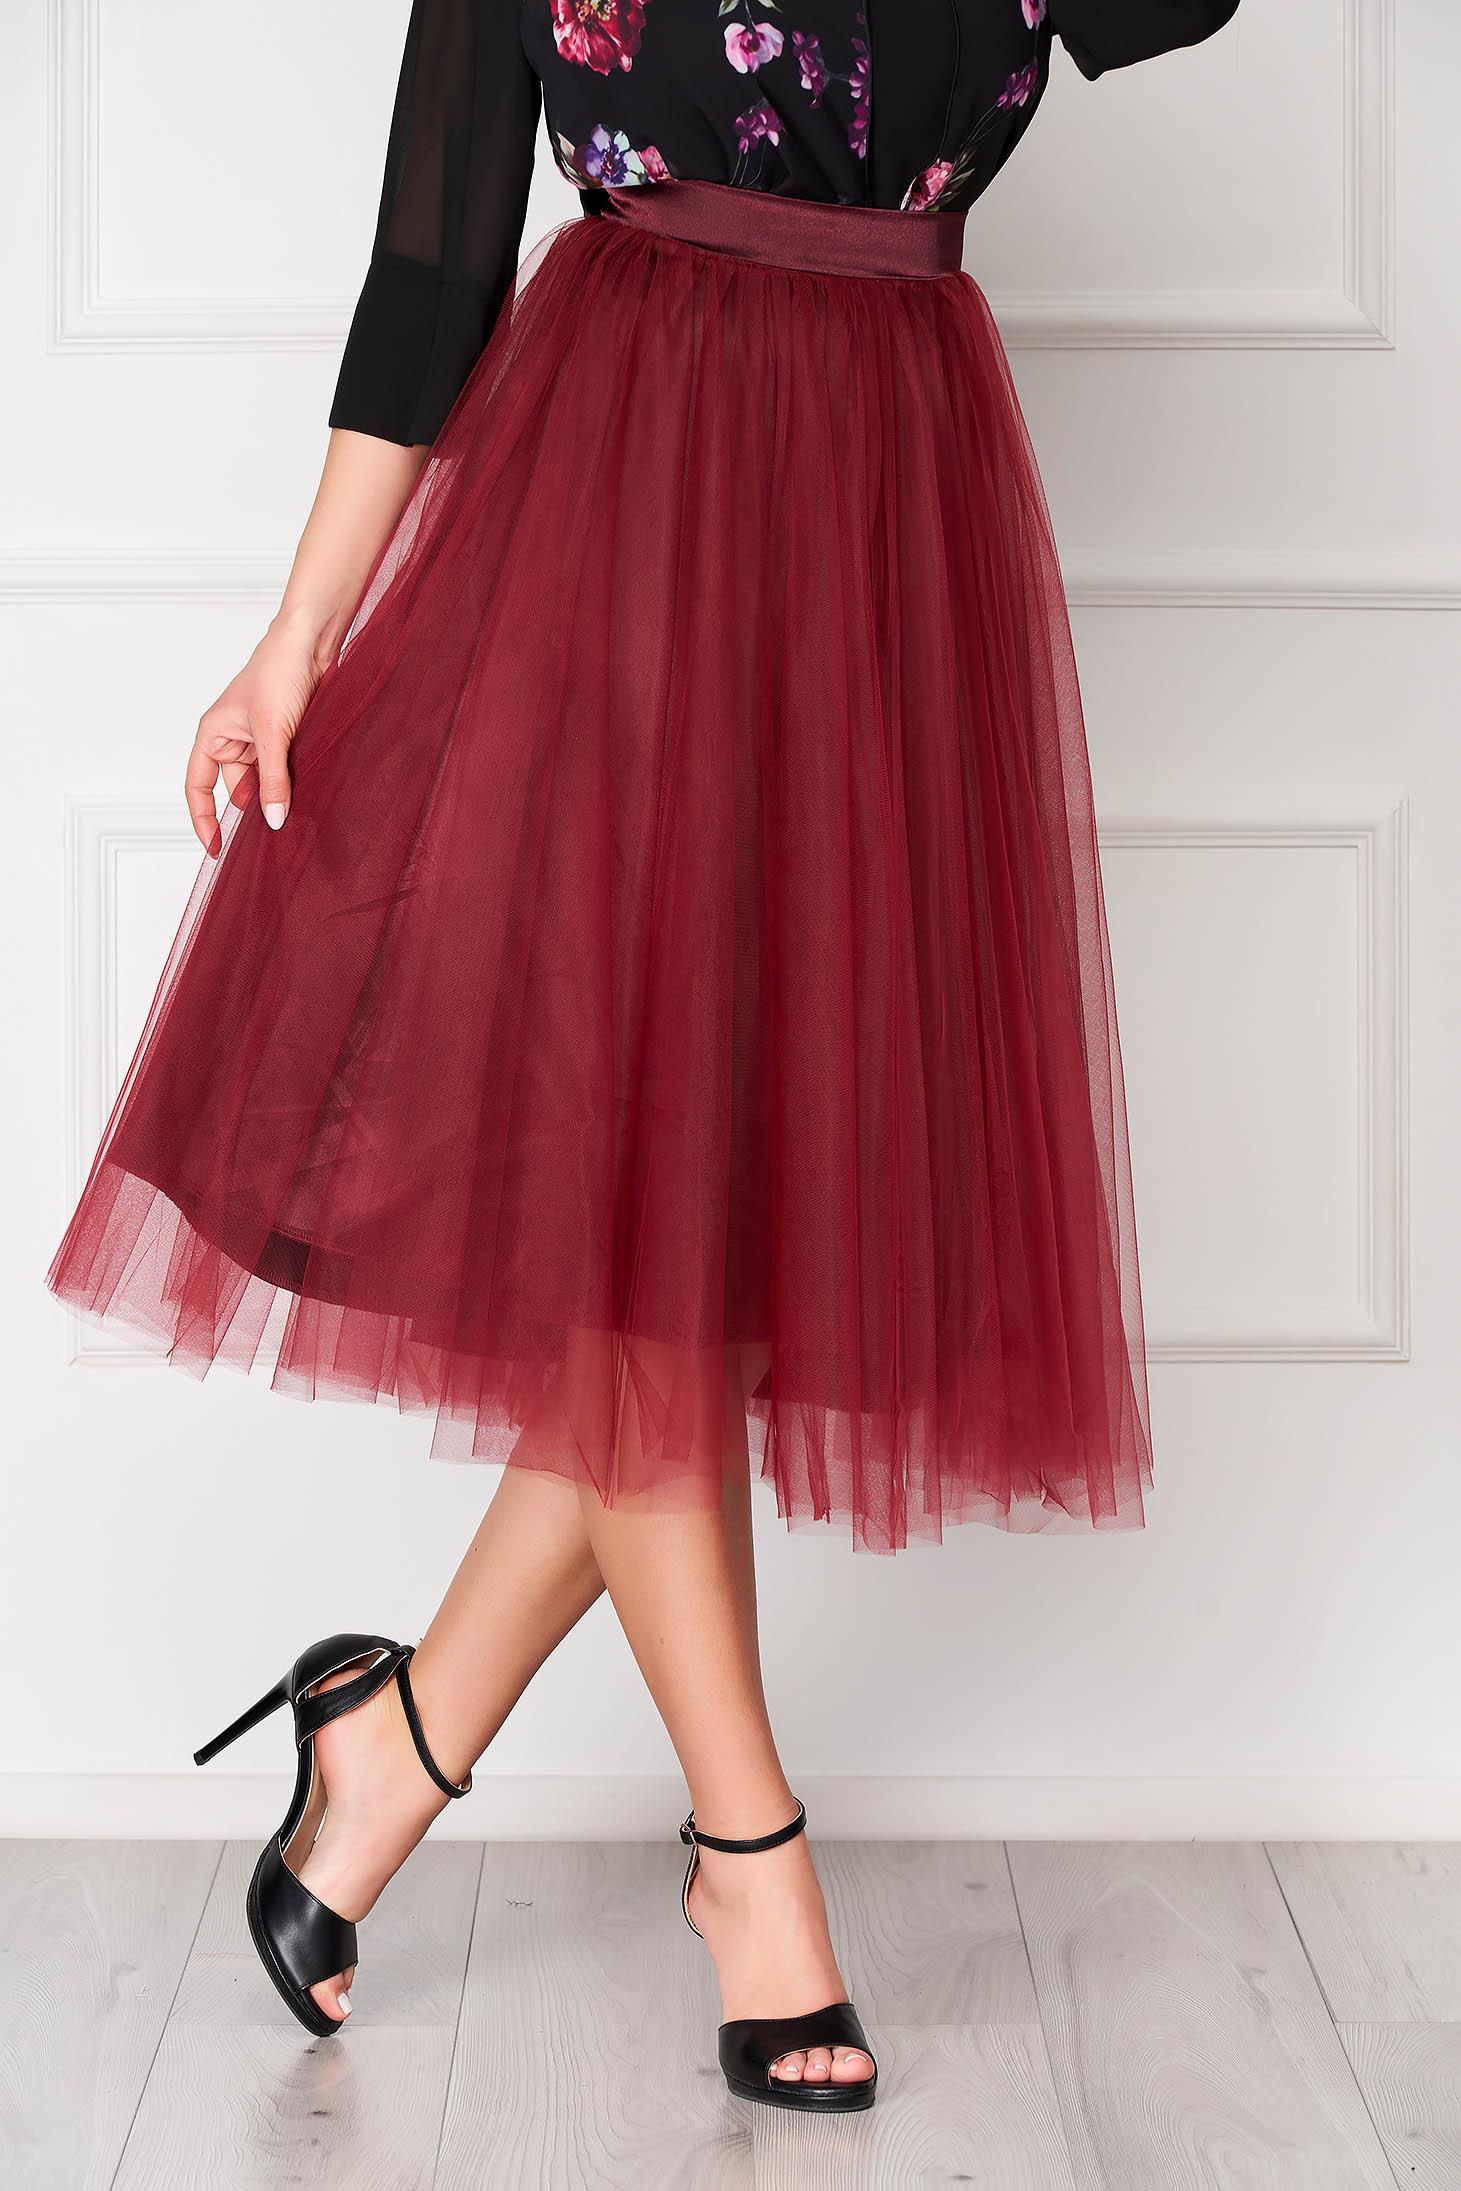 StarShinerS burgundy elegant midi high waisted cloche skirt from tulle